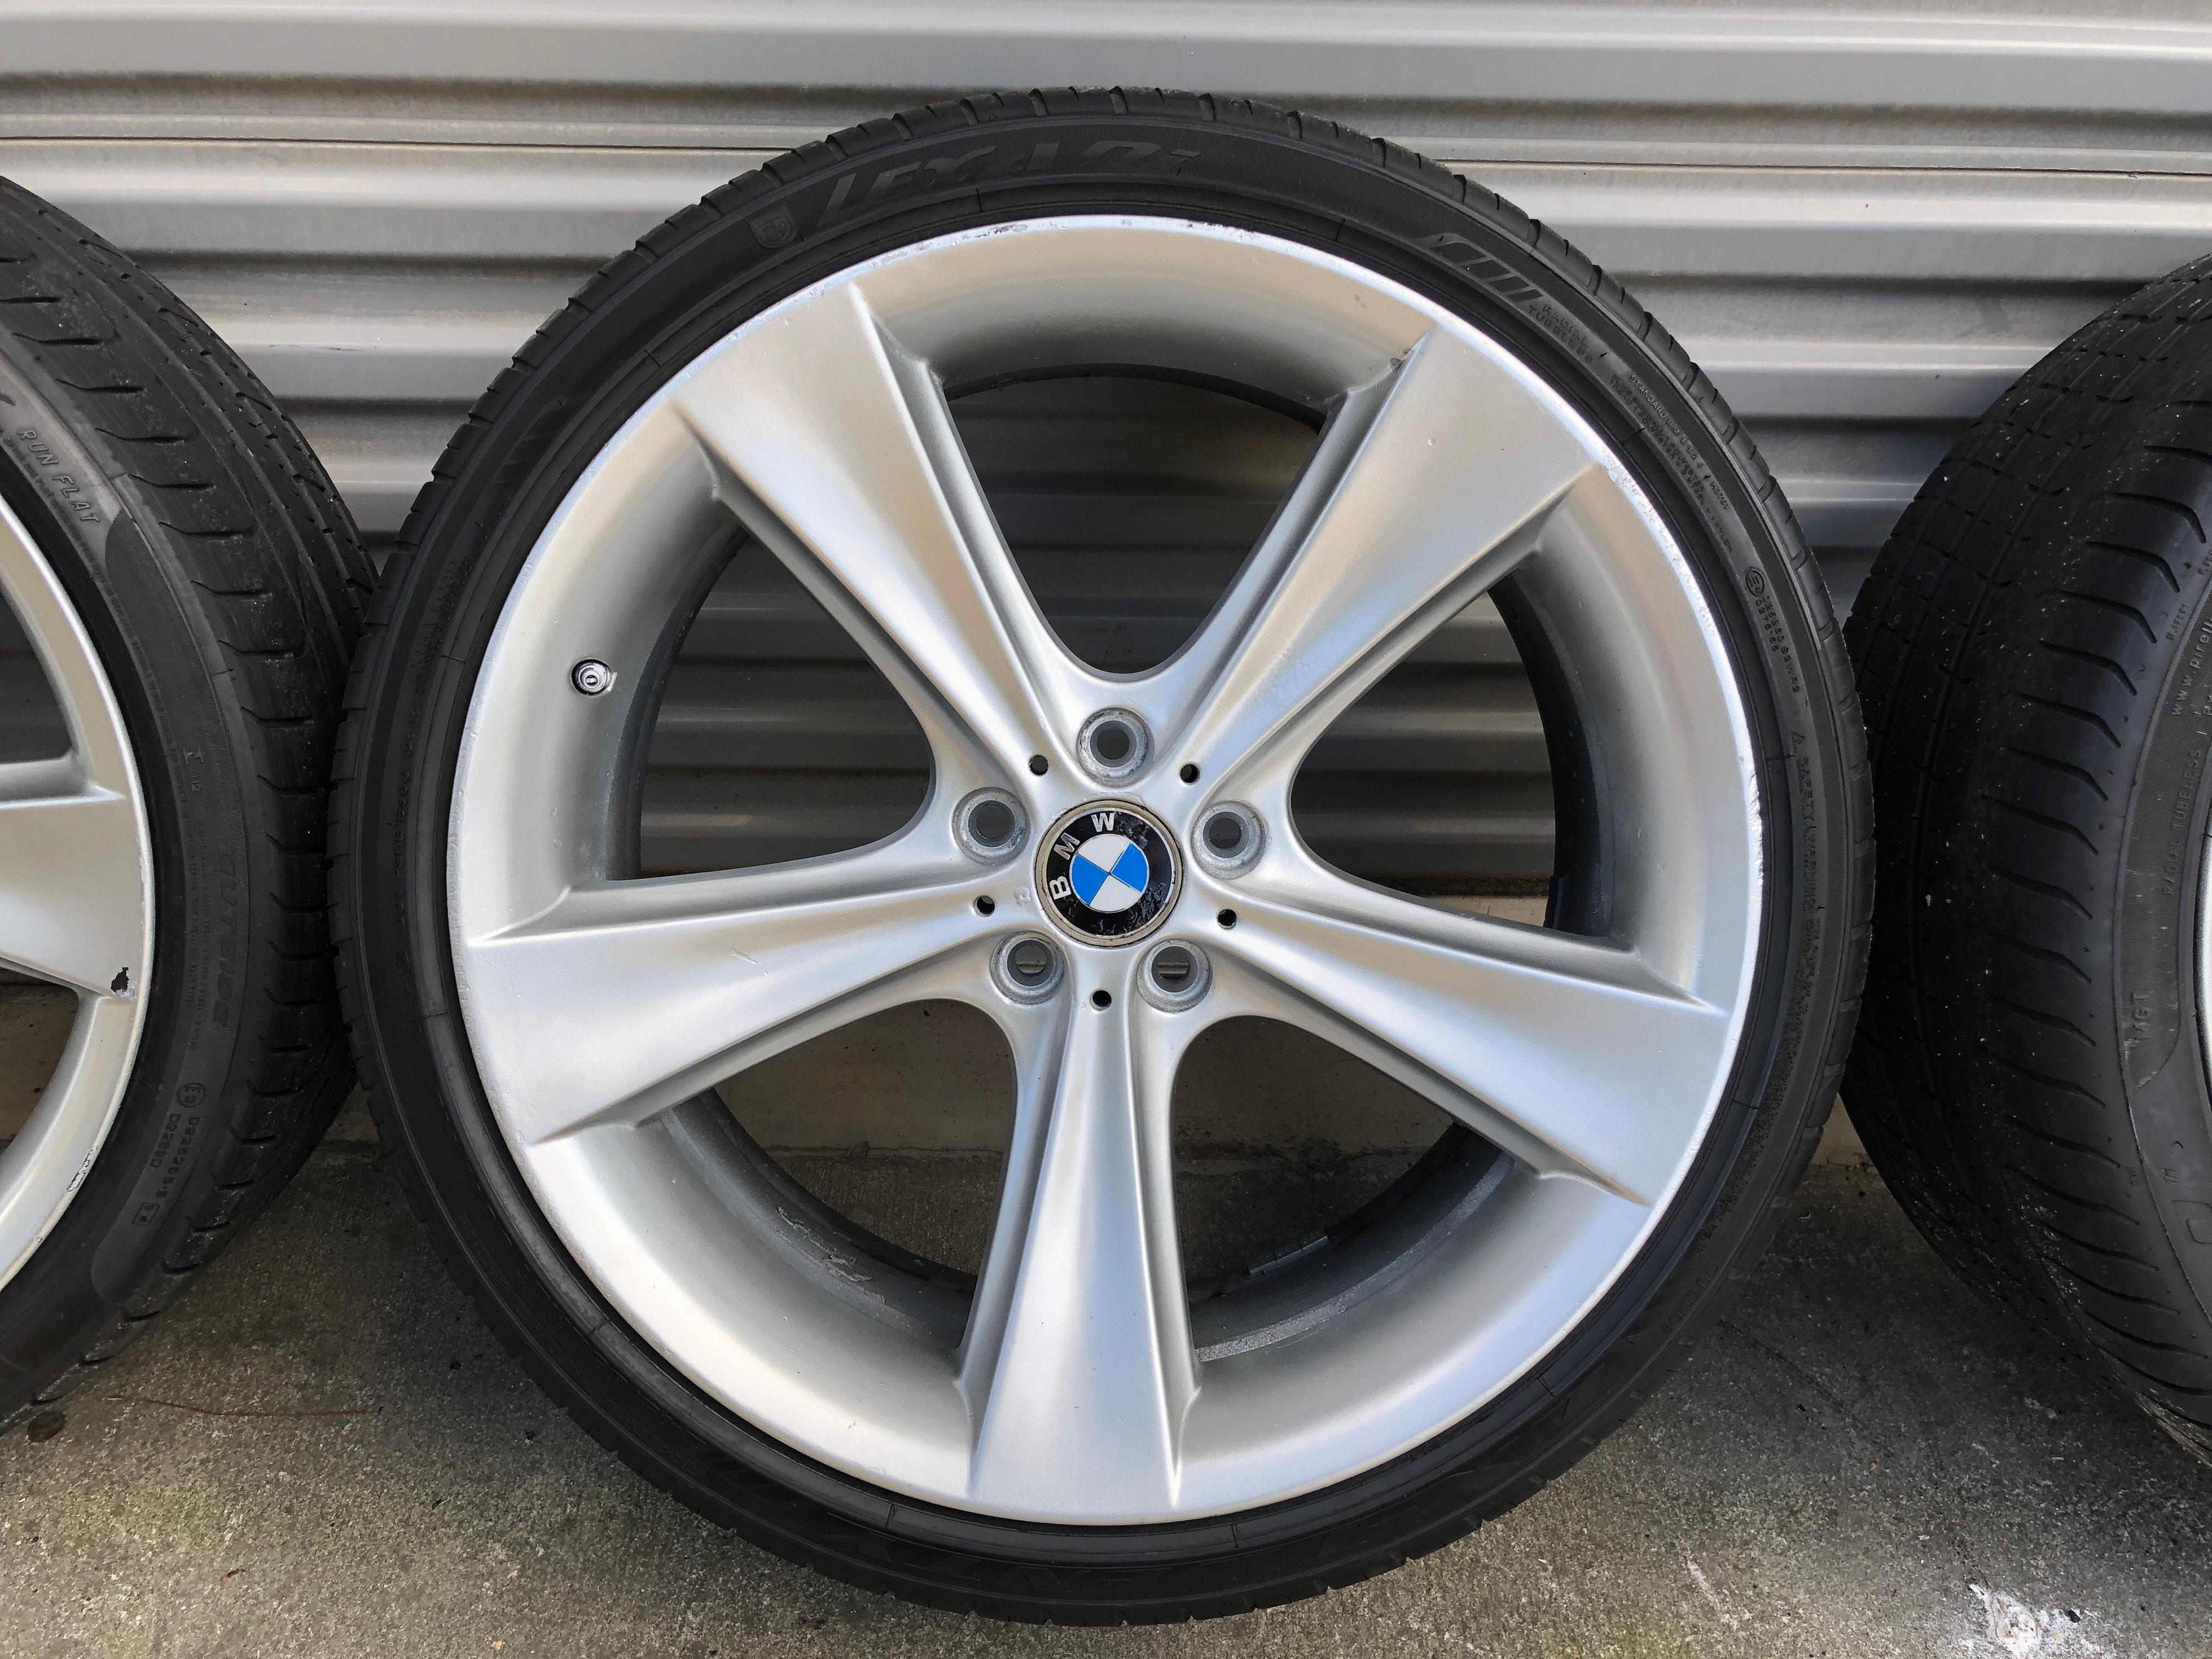 BMW Rims Style >> 21 Oem Bmw Rims Style 128 For 7 Series 740i 745i 750i